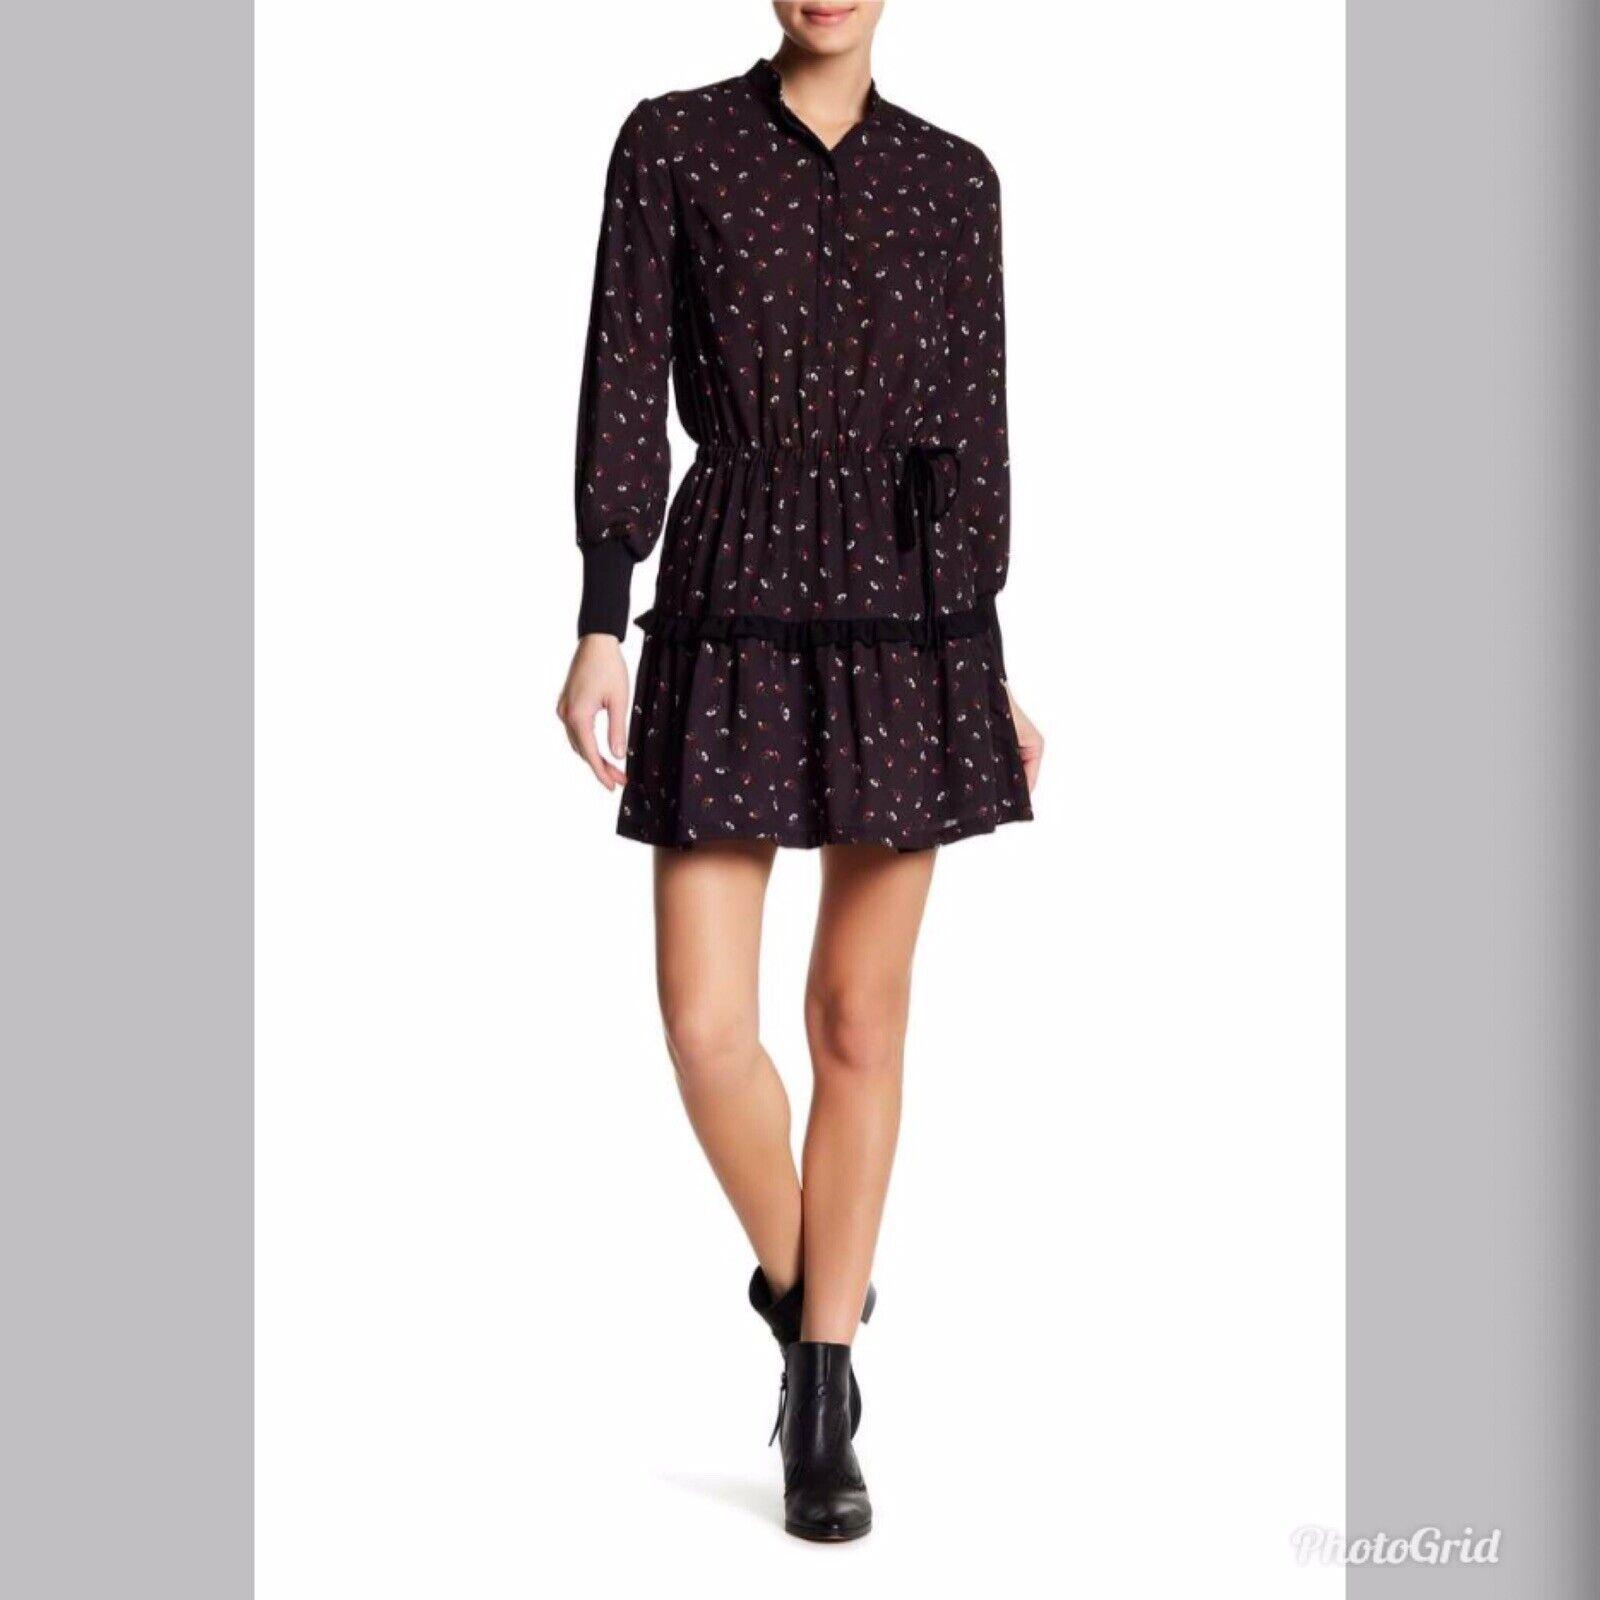 DAVID NAMAN damen Ornella Floral Dress Größe 40 EUR Small S Navy Long Sleeve